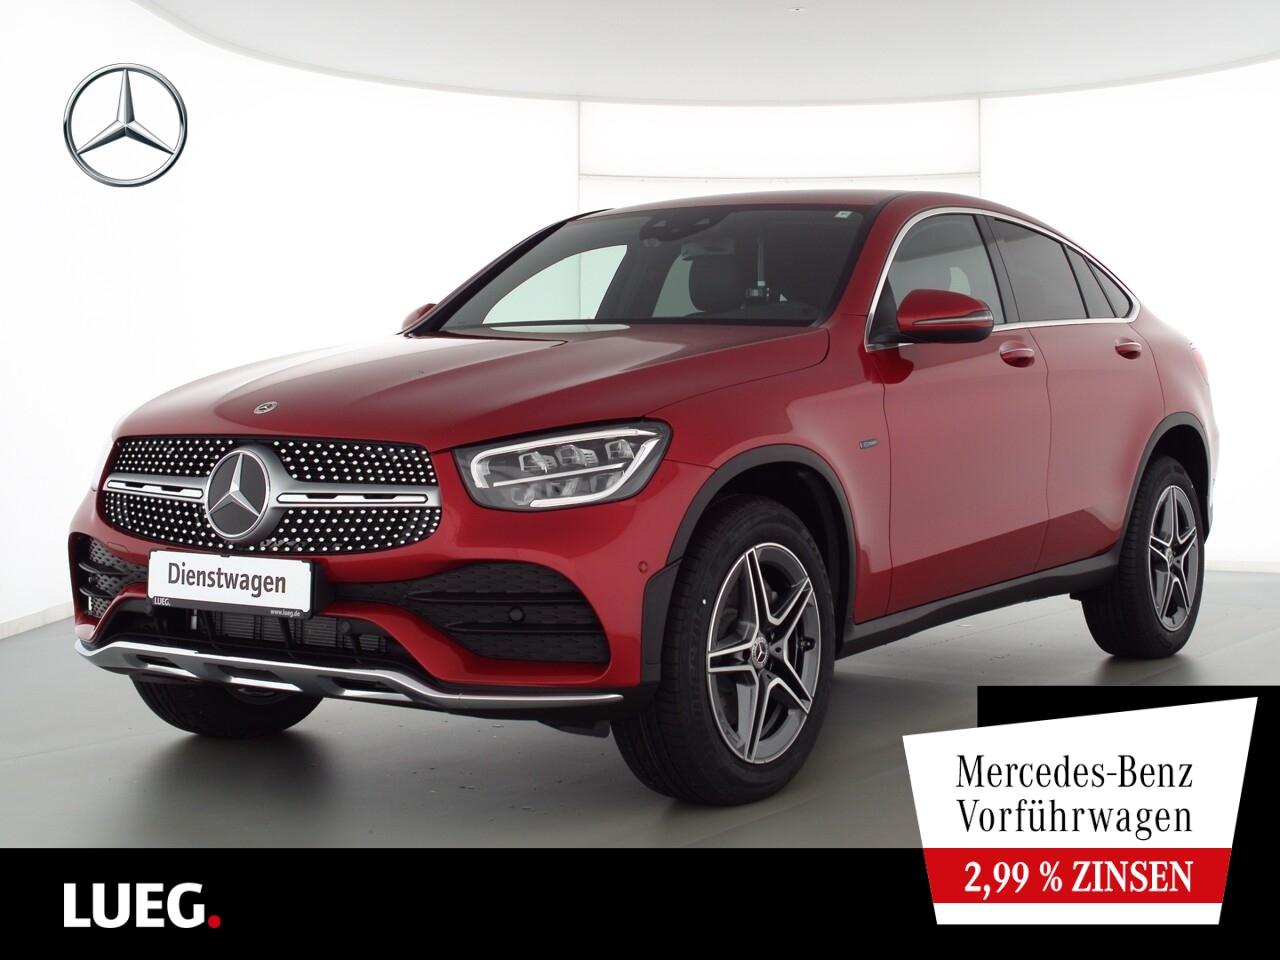 Mercedes-Benz GLC 300 de 4M Coupé AMG+AHK+KEYLESS+BURMESTER, Jahr 2021, Hybrid_Diesel